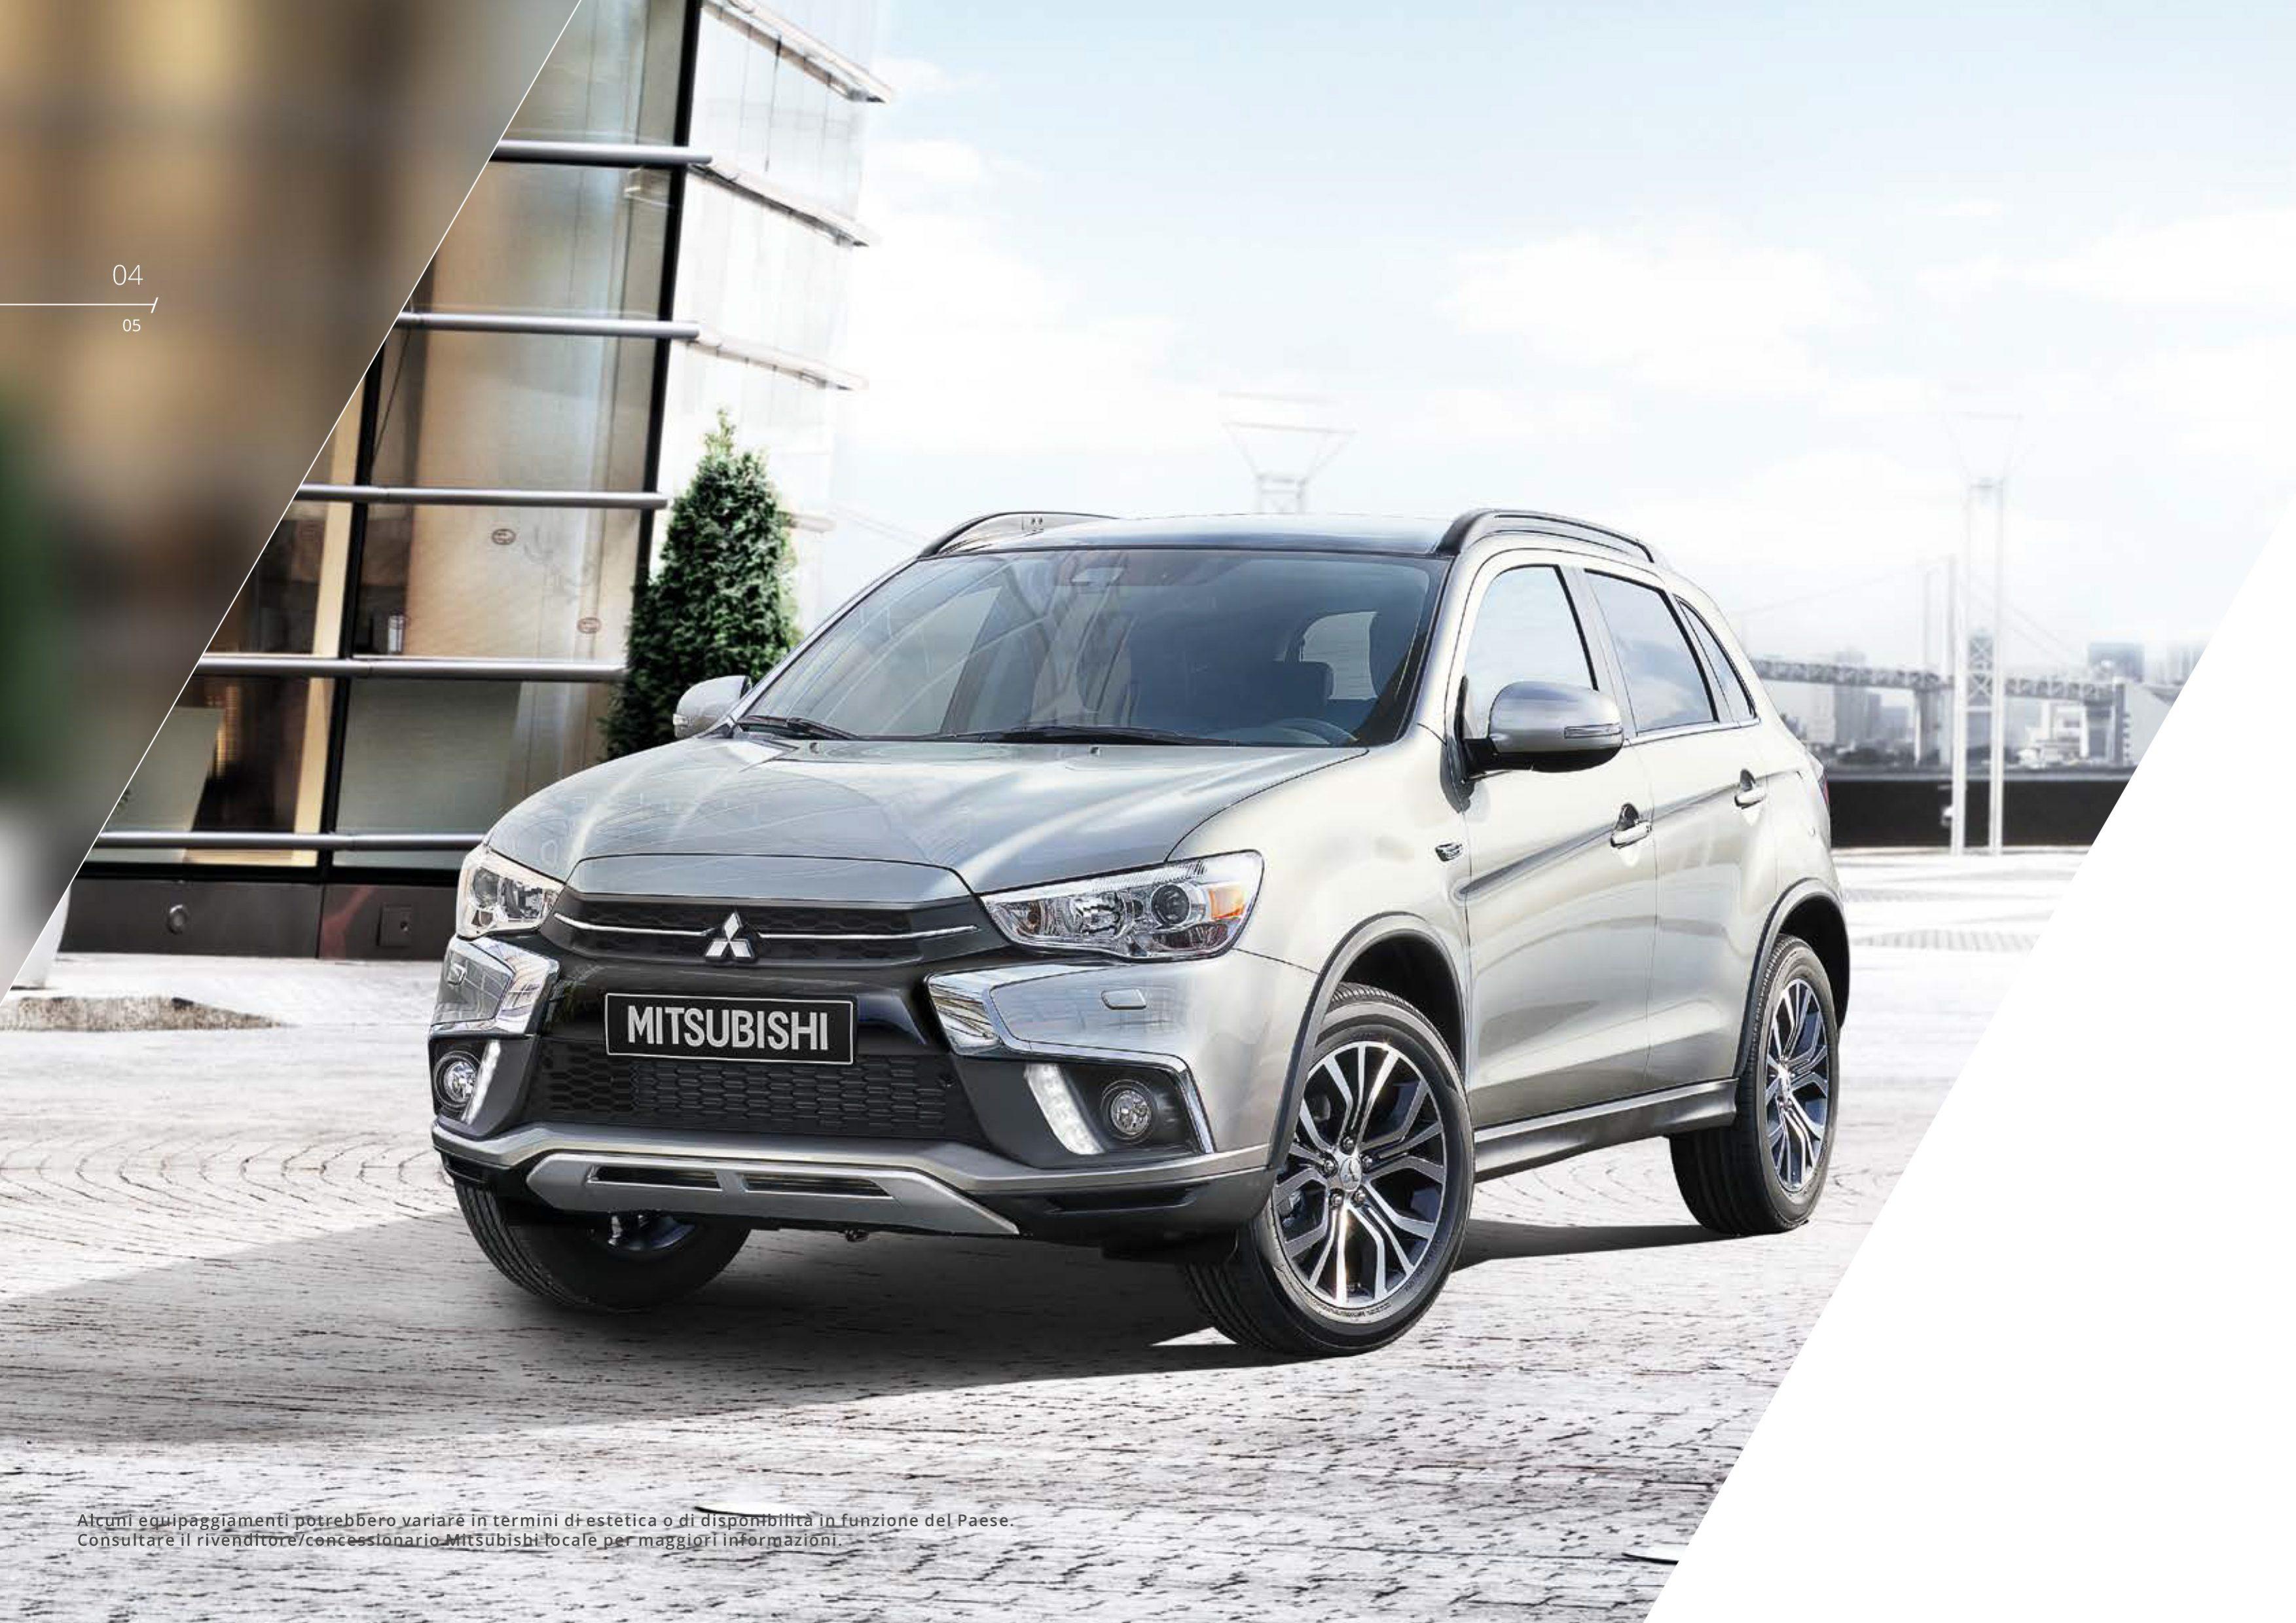 Mitsubishi ASX offerta del mese